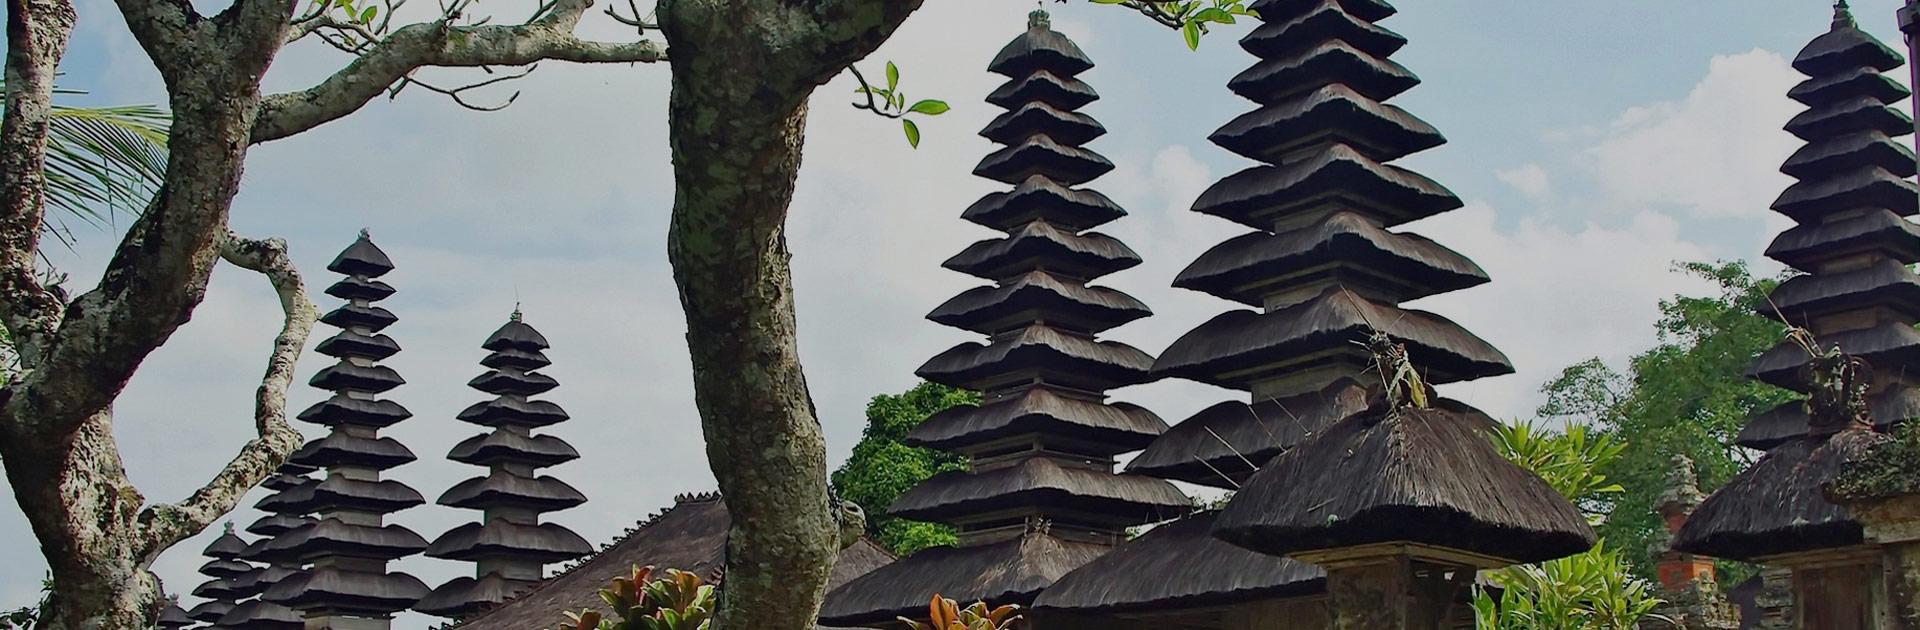 ID Bali Circuito Interior y Gili 5